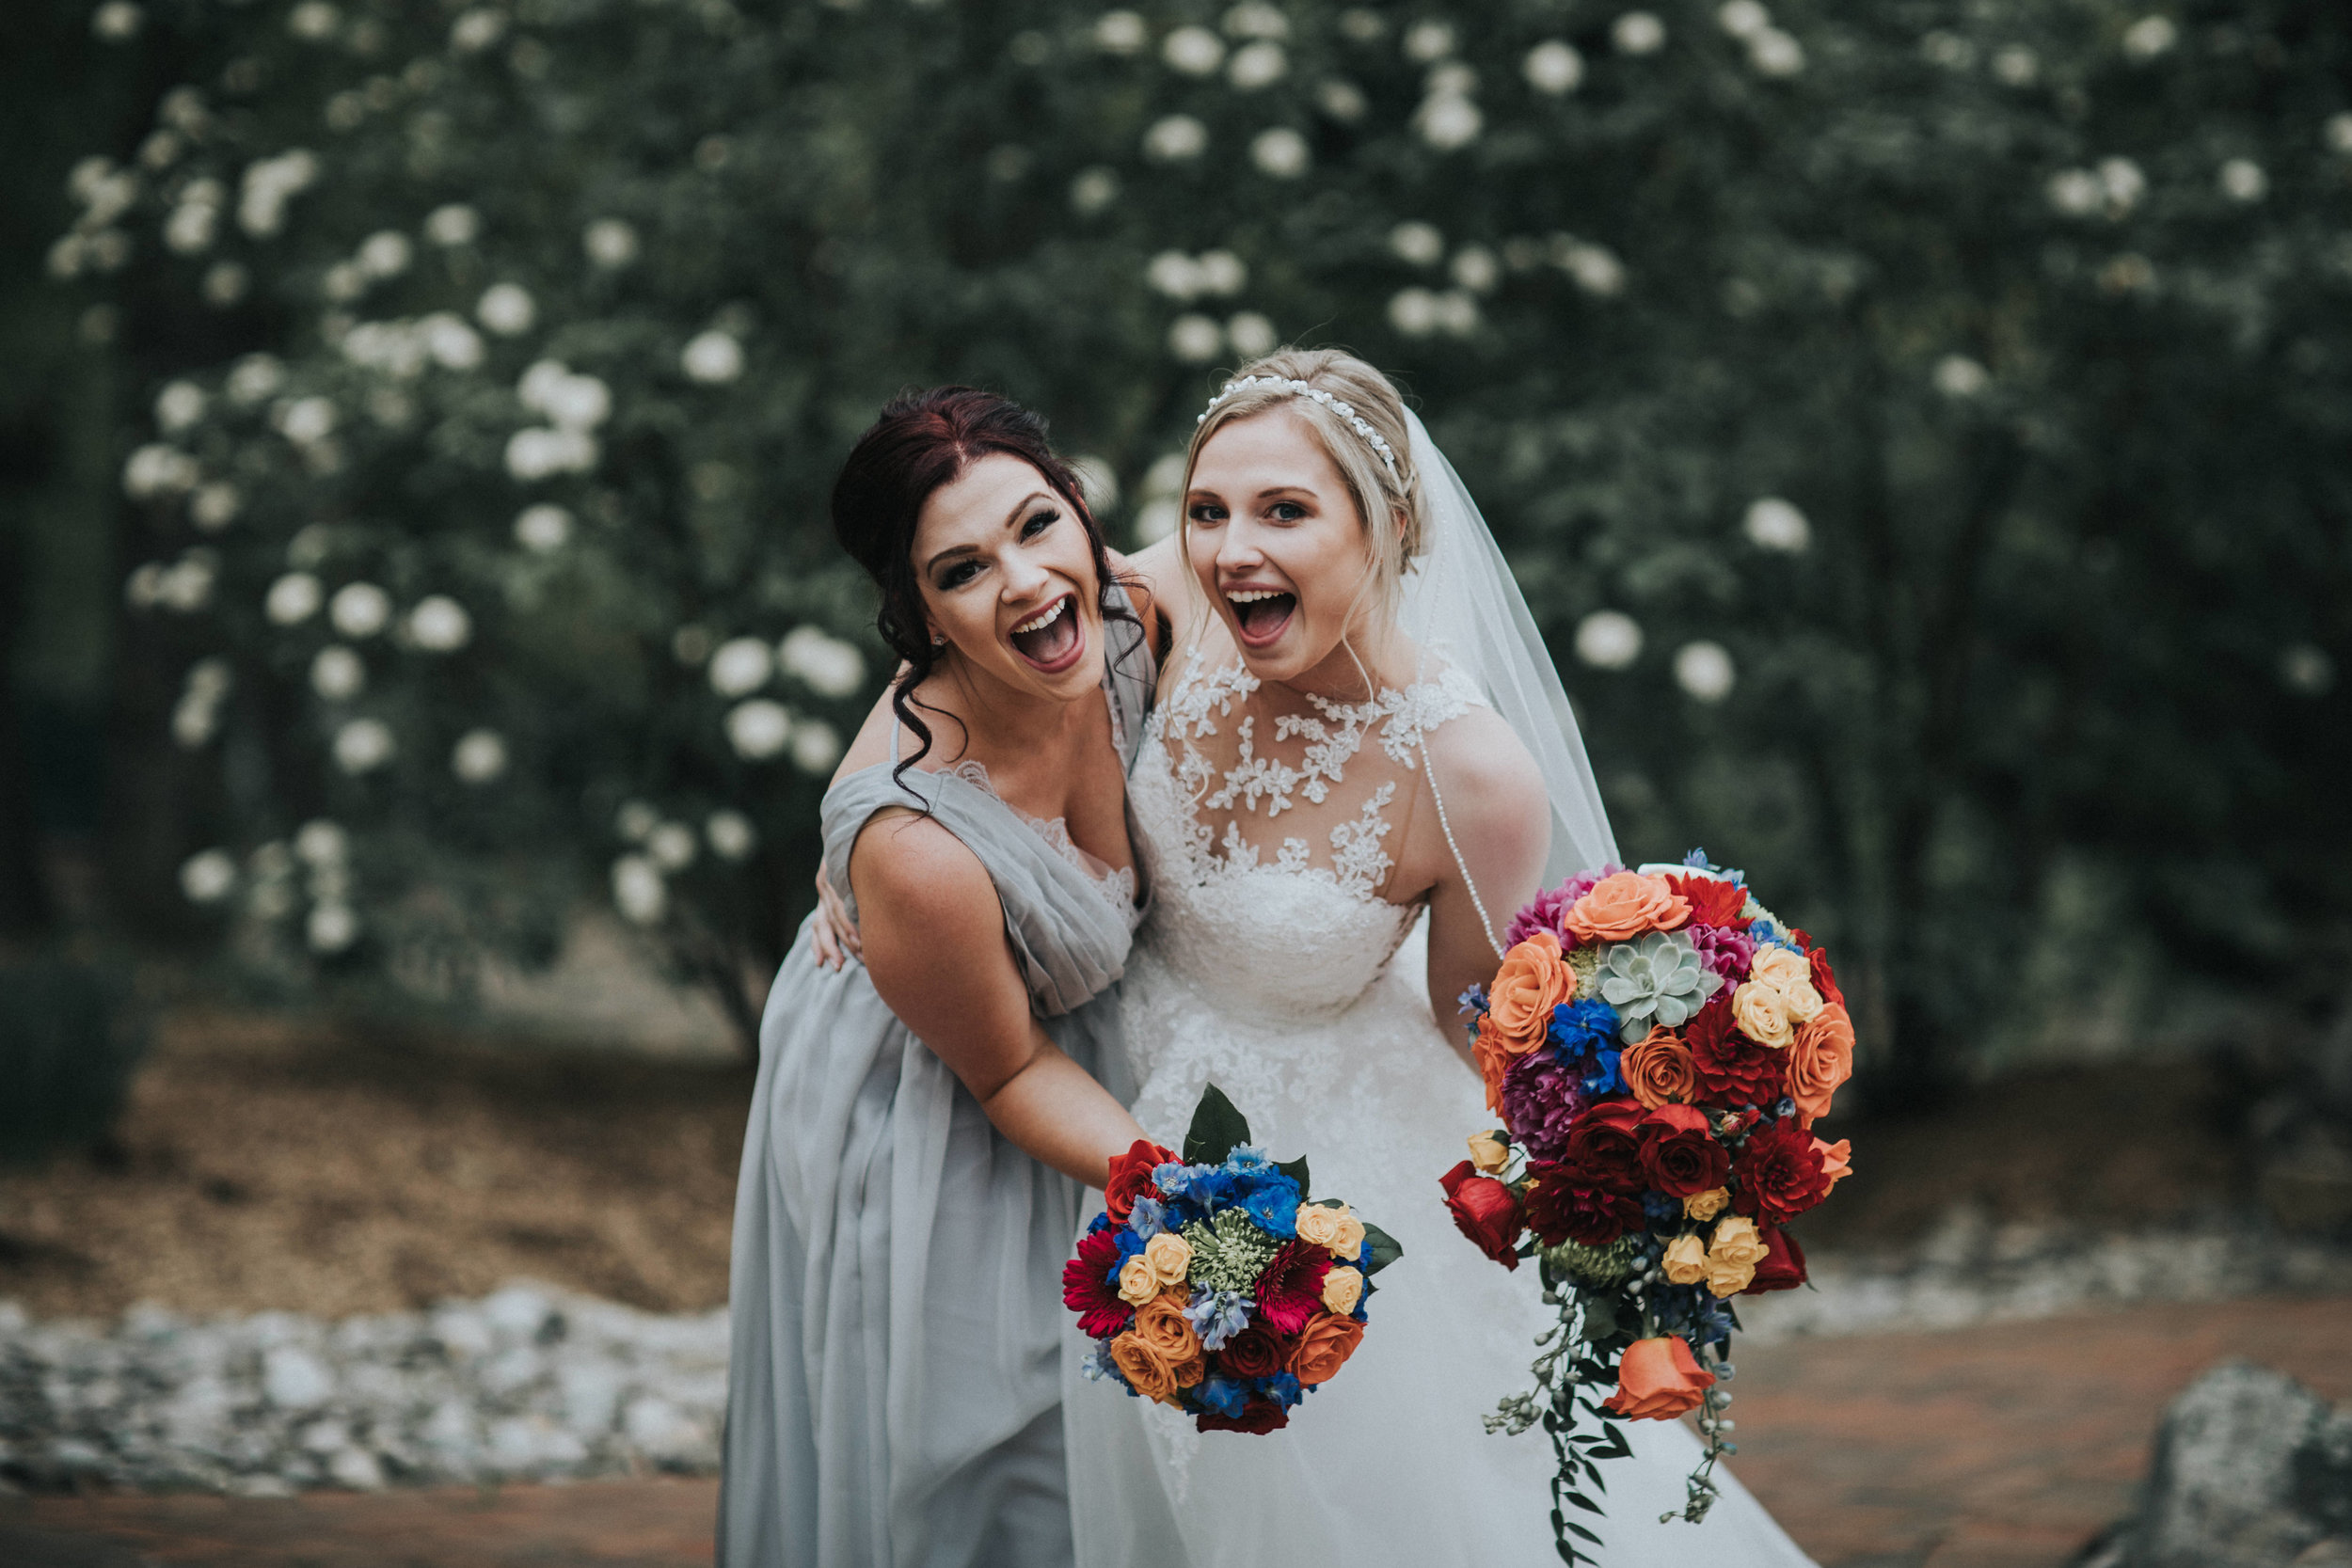 New-Jersey-Wedding-Photographer-Megan&Nick-BridalParty-23.jpg